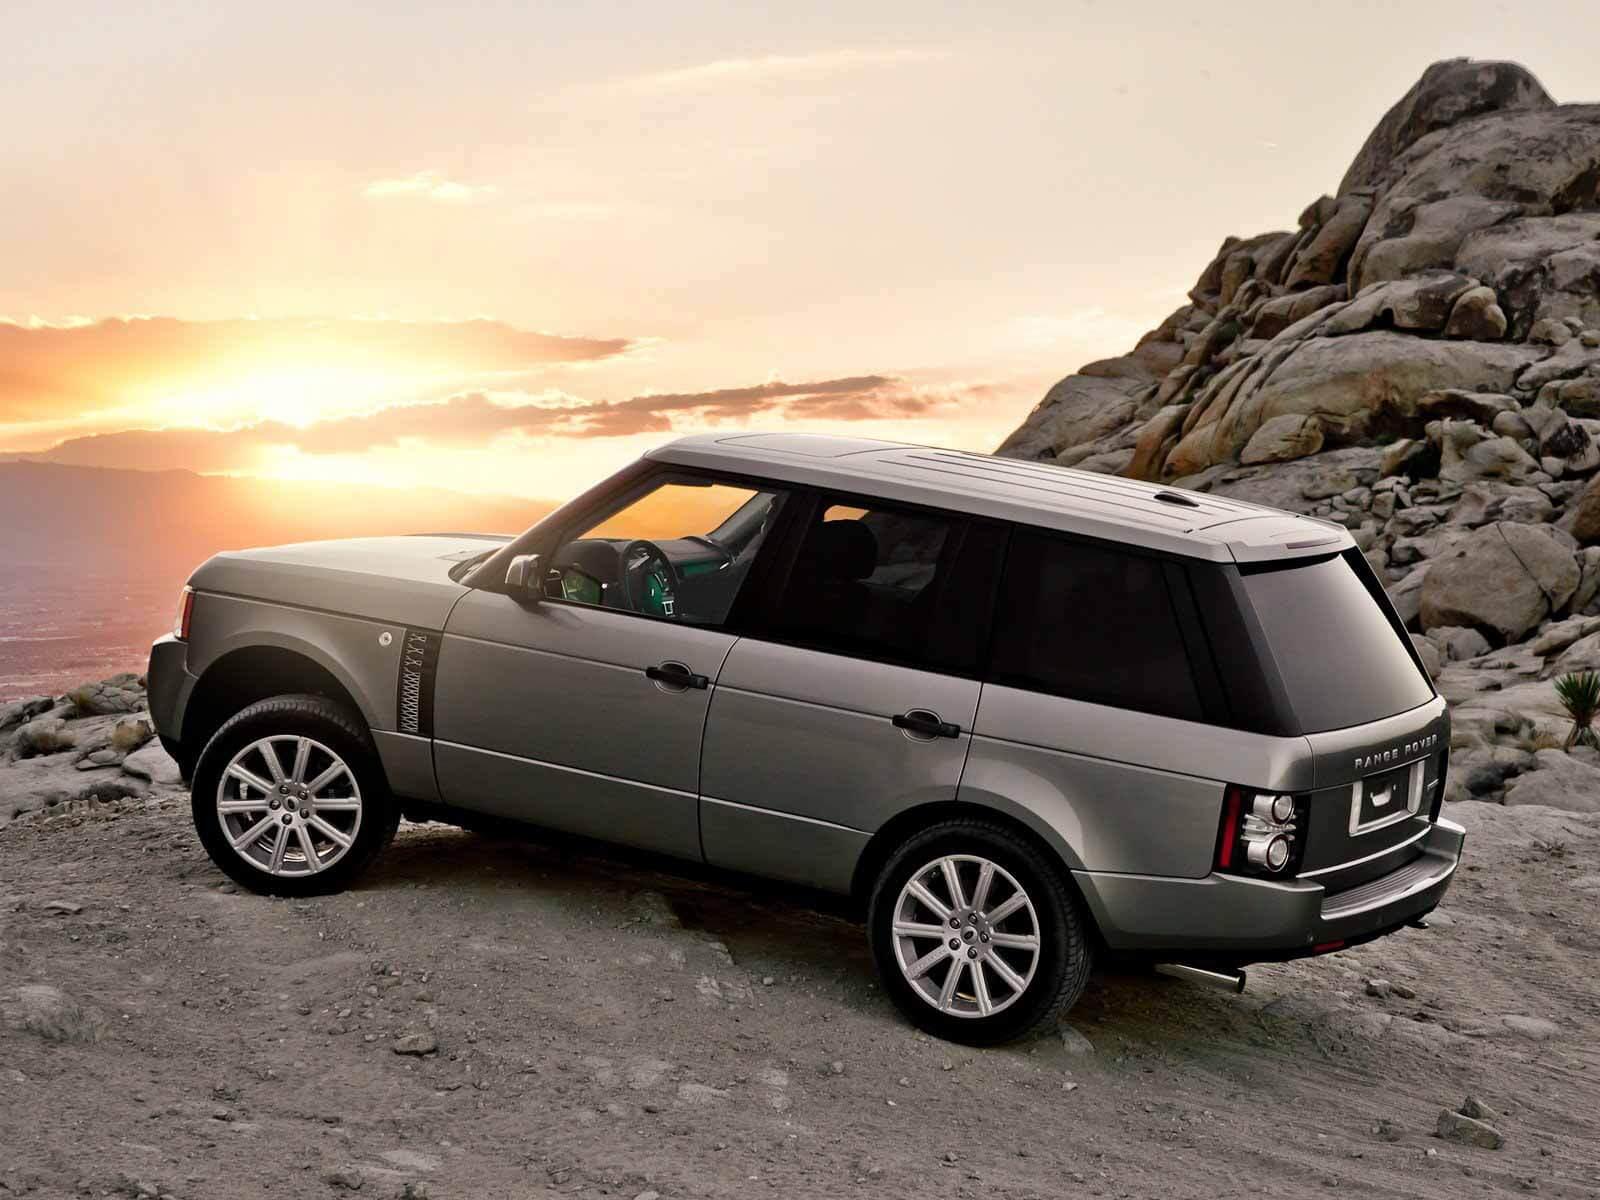 На что способен Range Rover 3 менее 400 000 км?